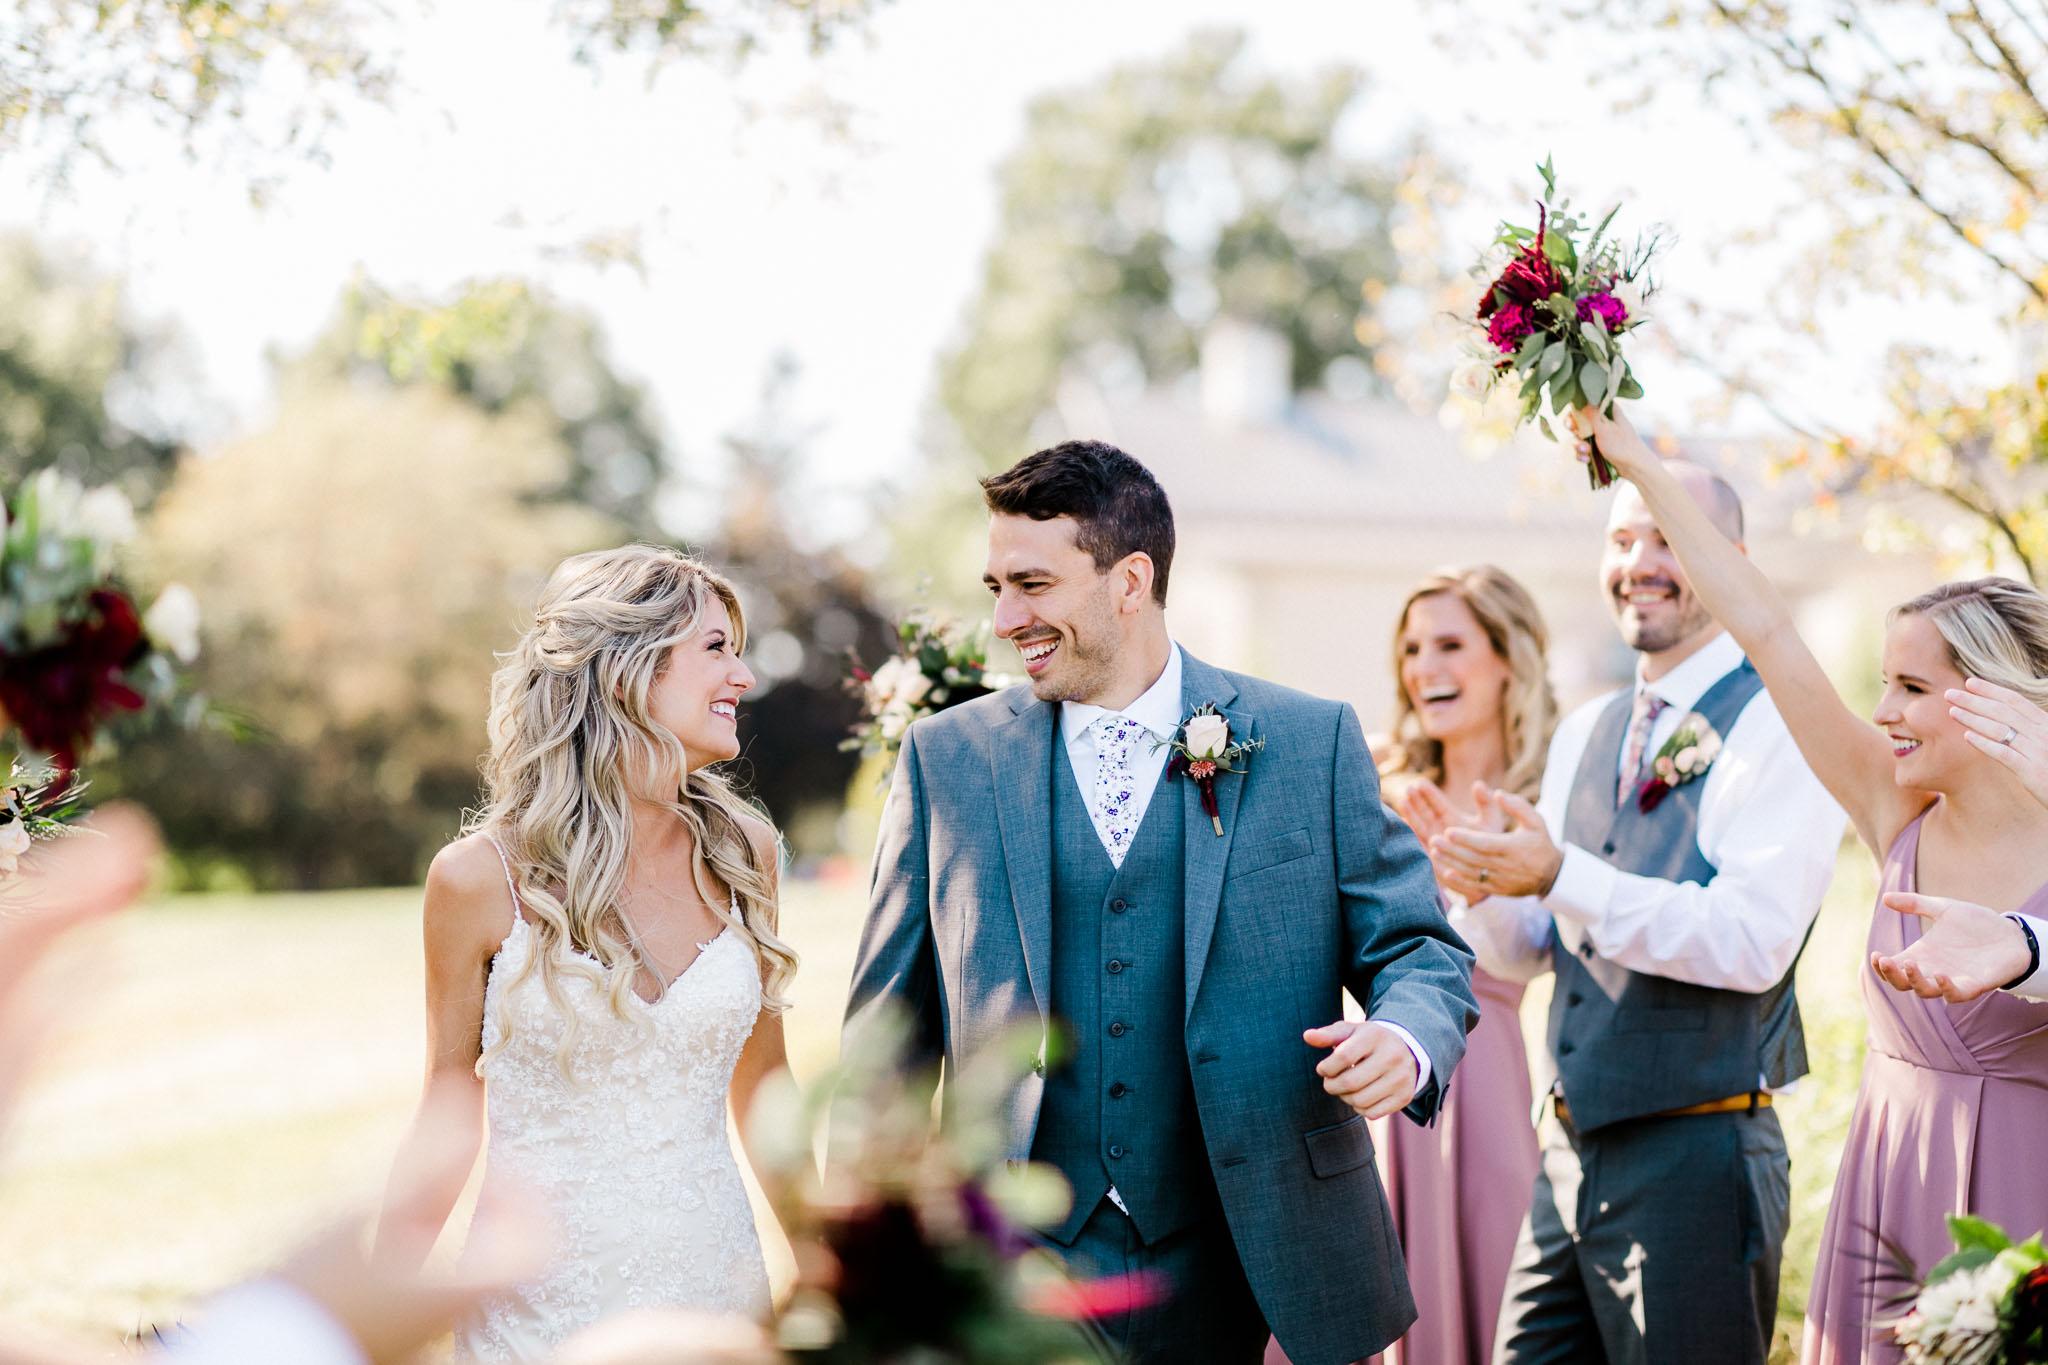 Frosty-Valley-September-Wedding-7298.jpg